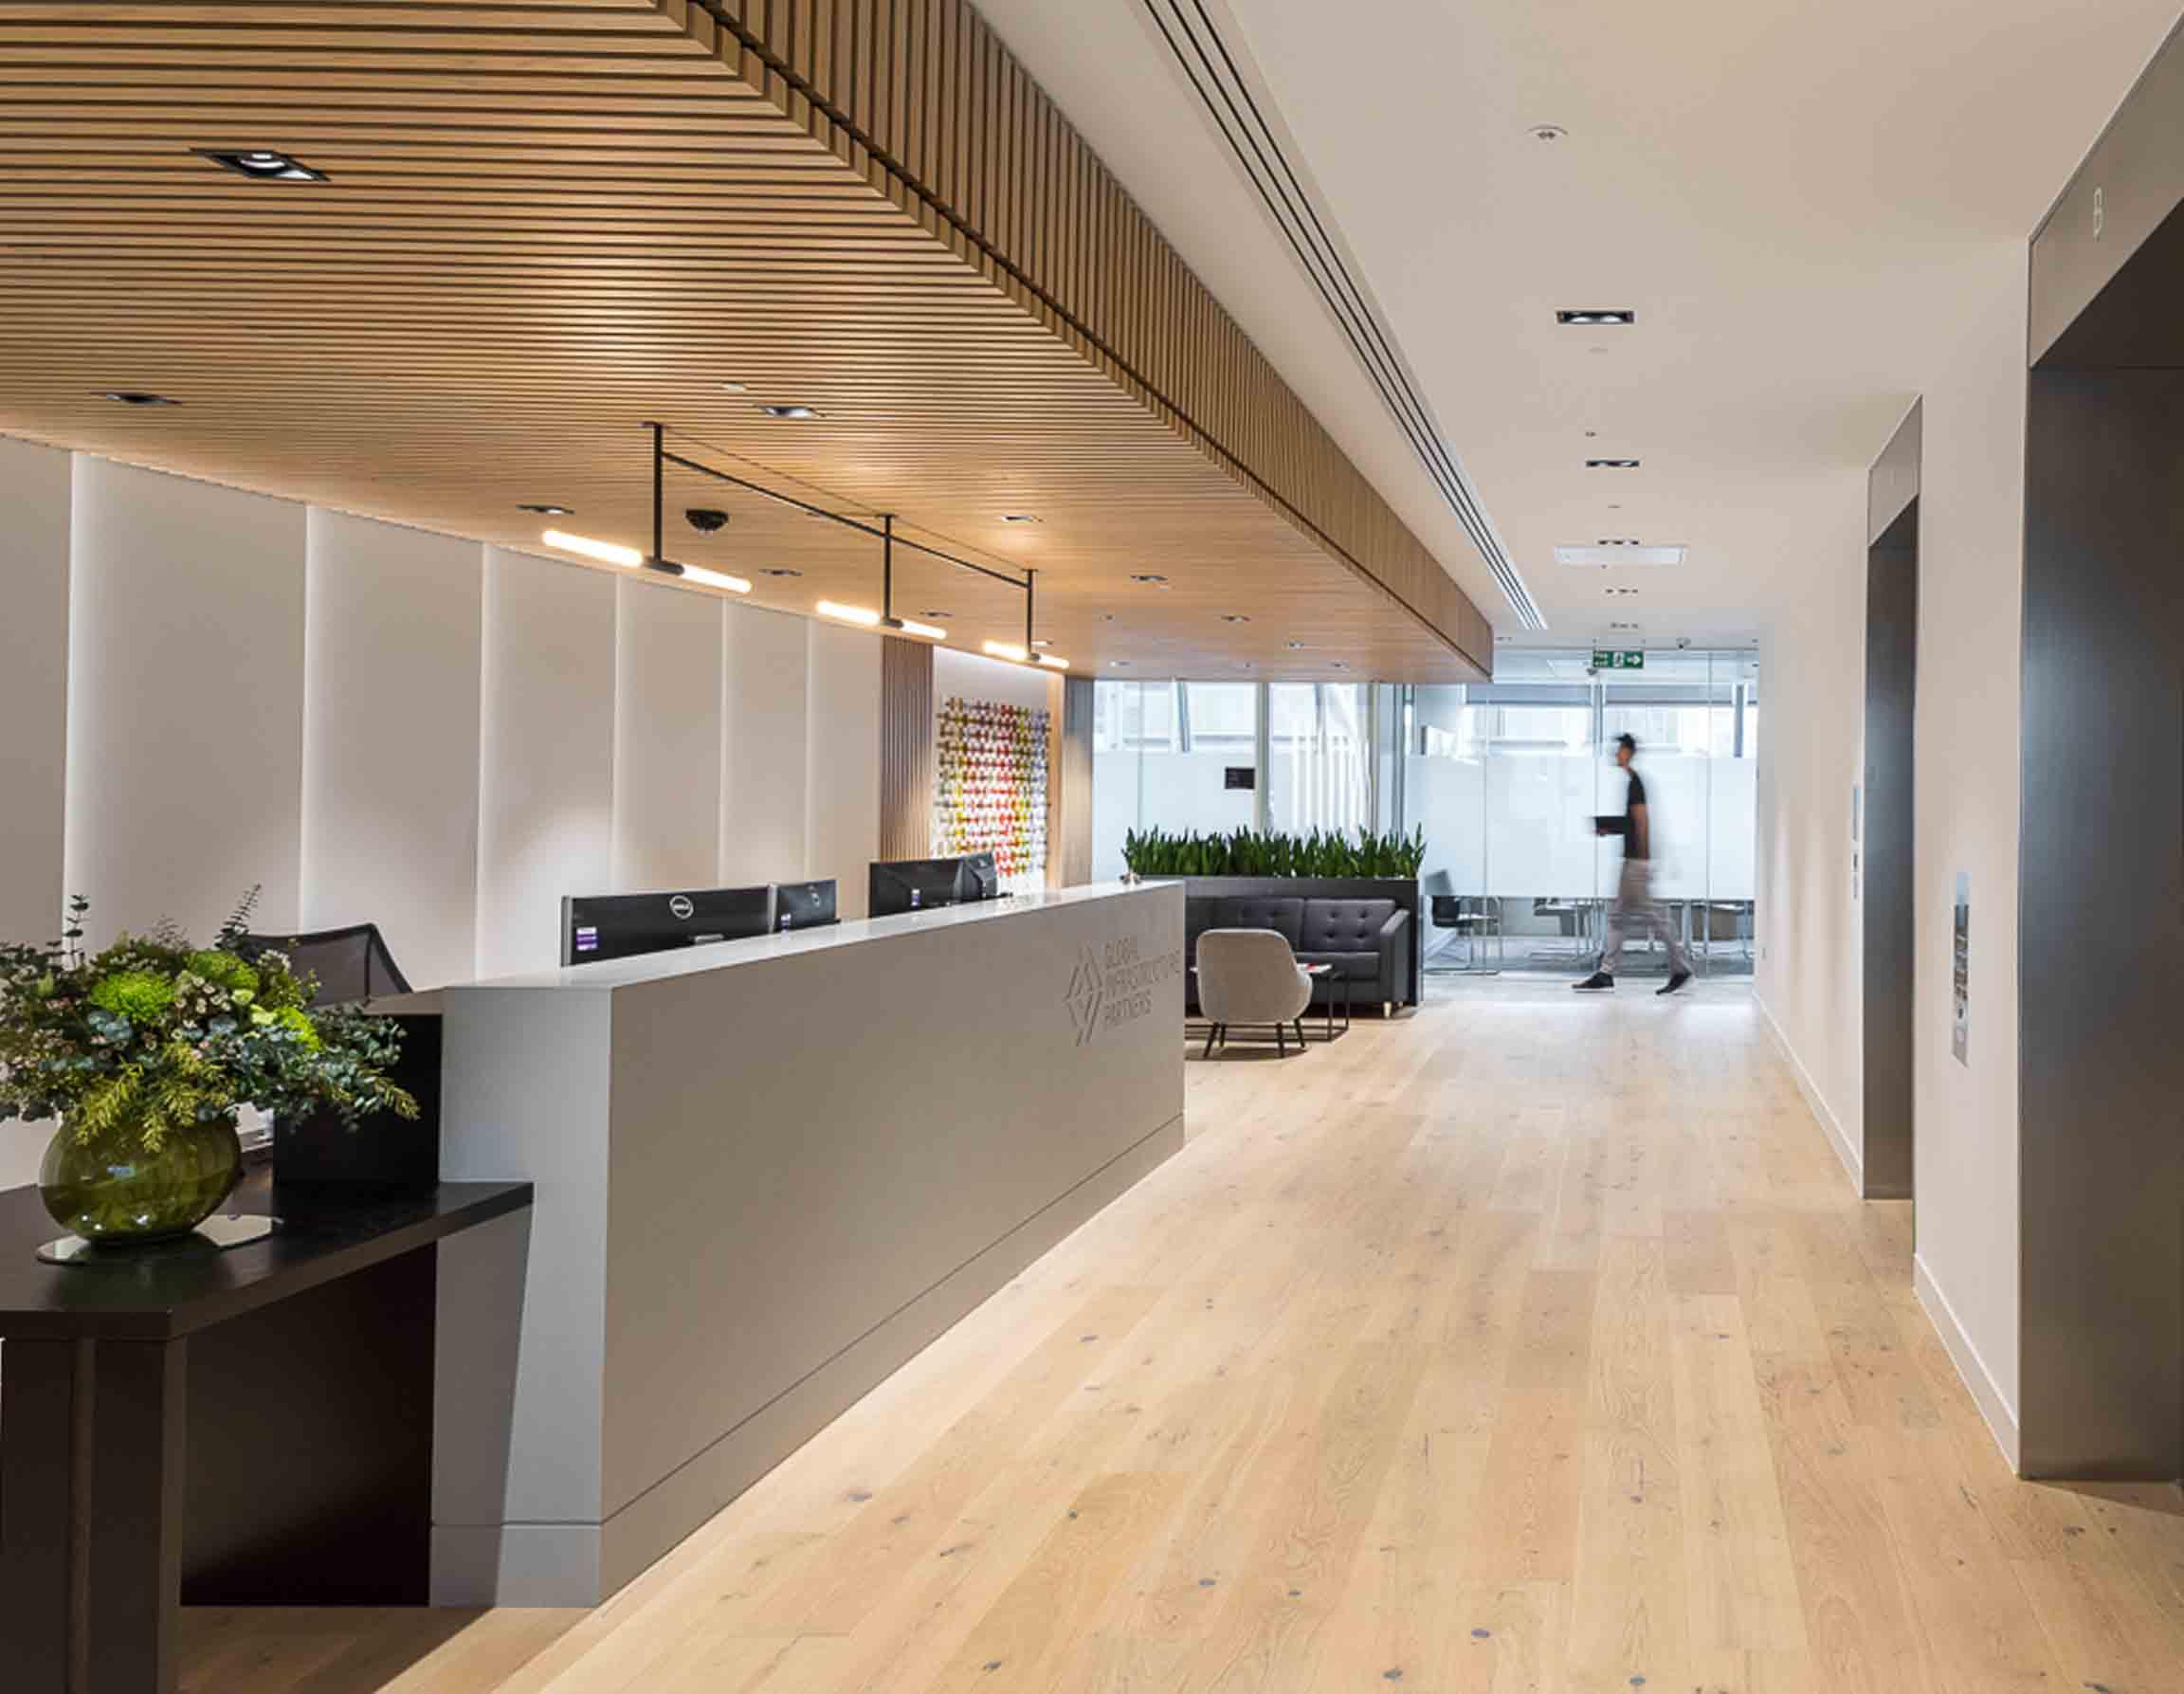 Handcrafted Minimalist Pendant Light Feature Wooden Slat Ceiling Office Reception Desk Design Nulty Bespoke